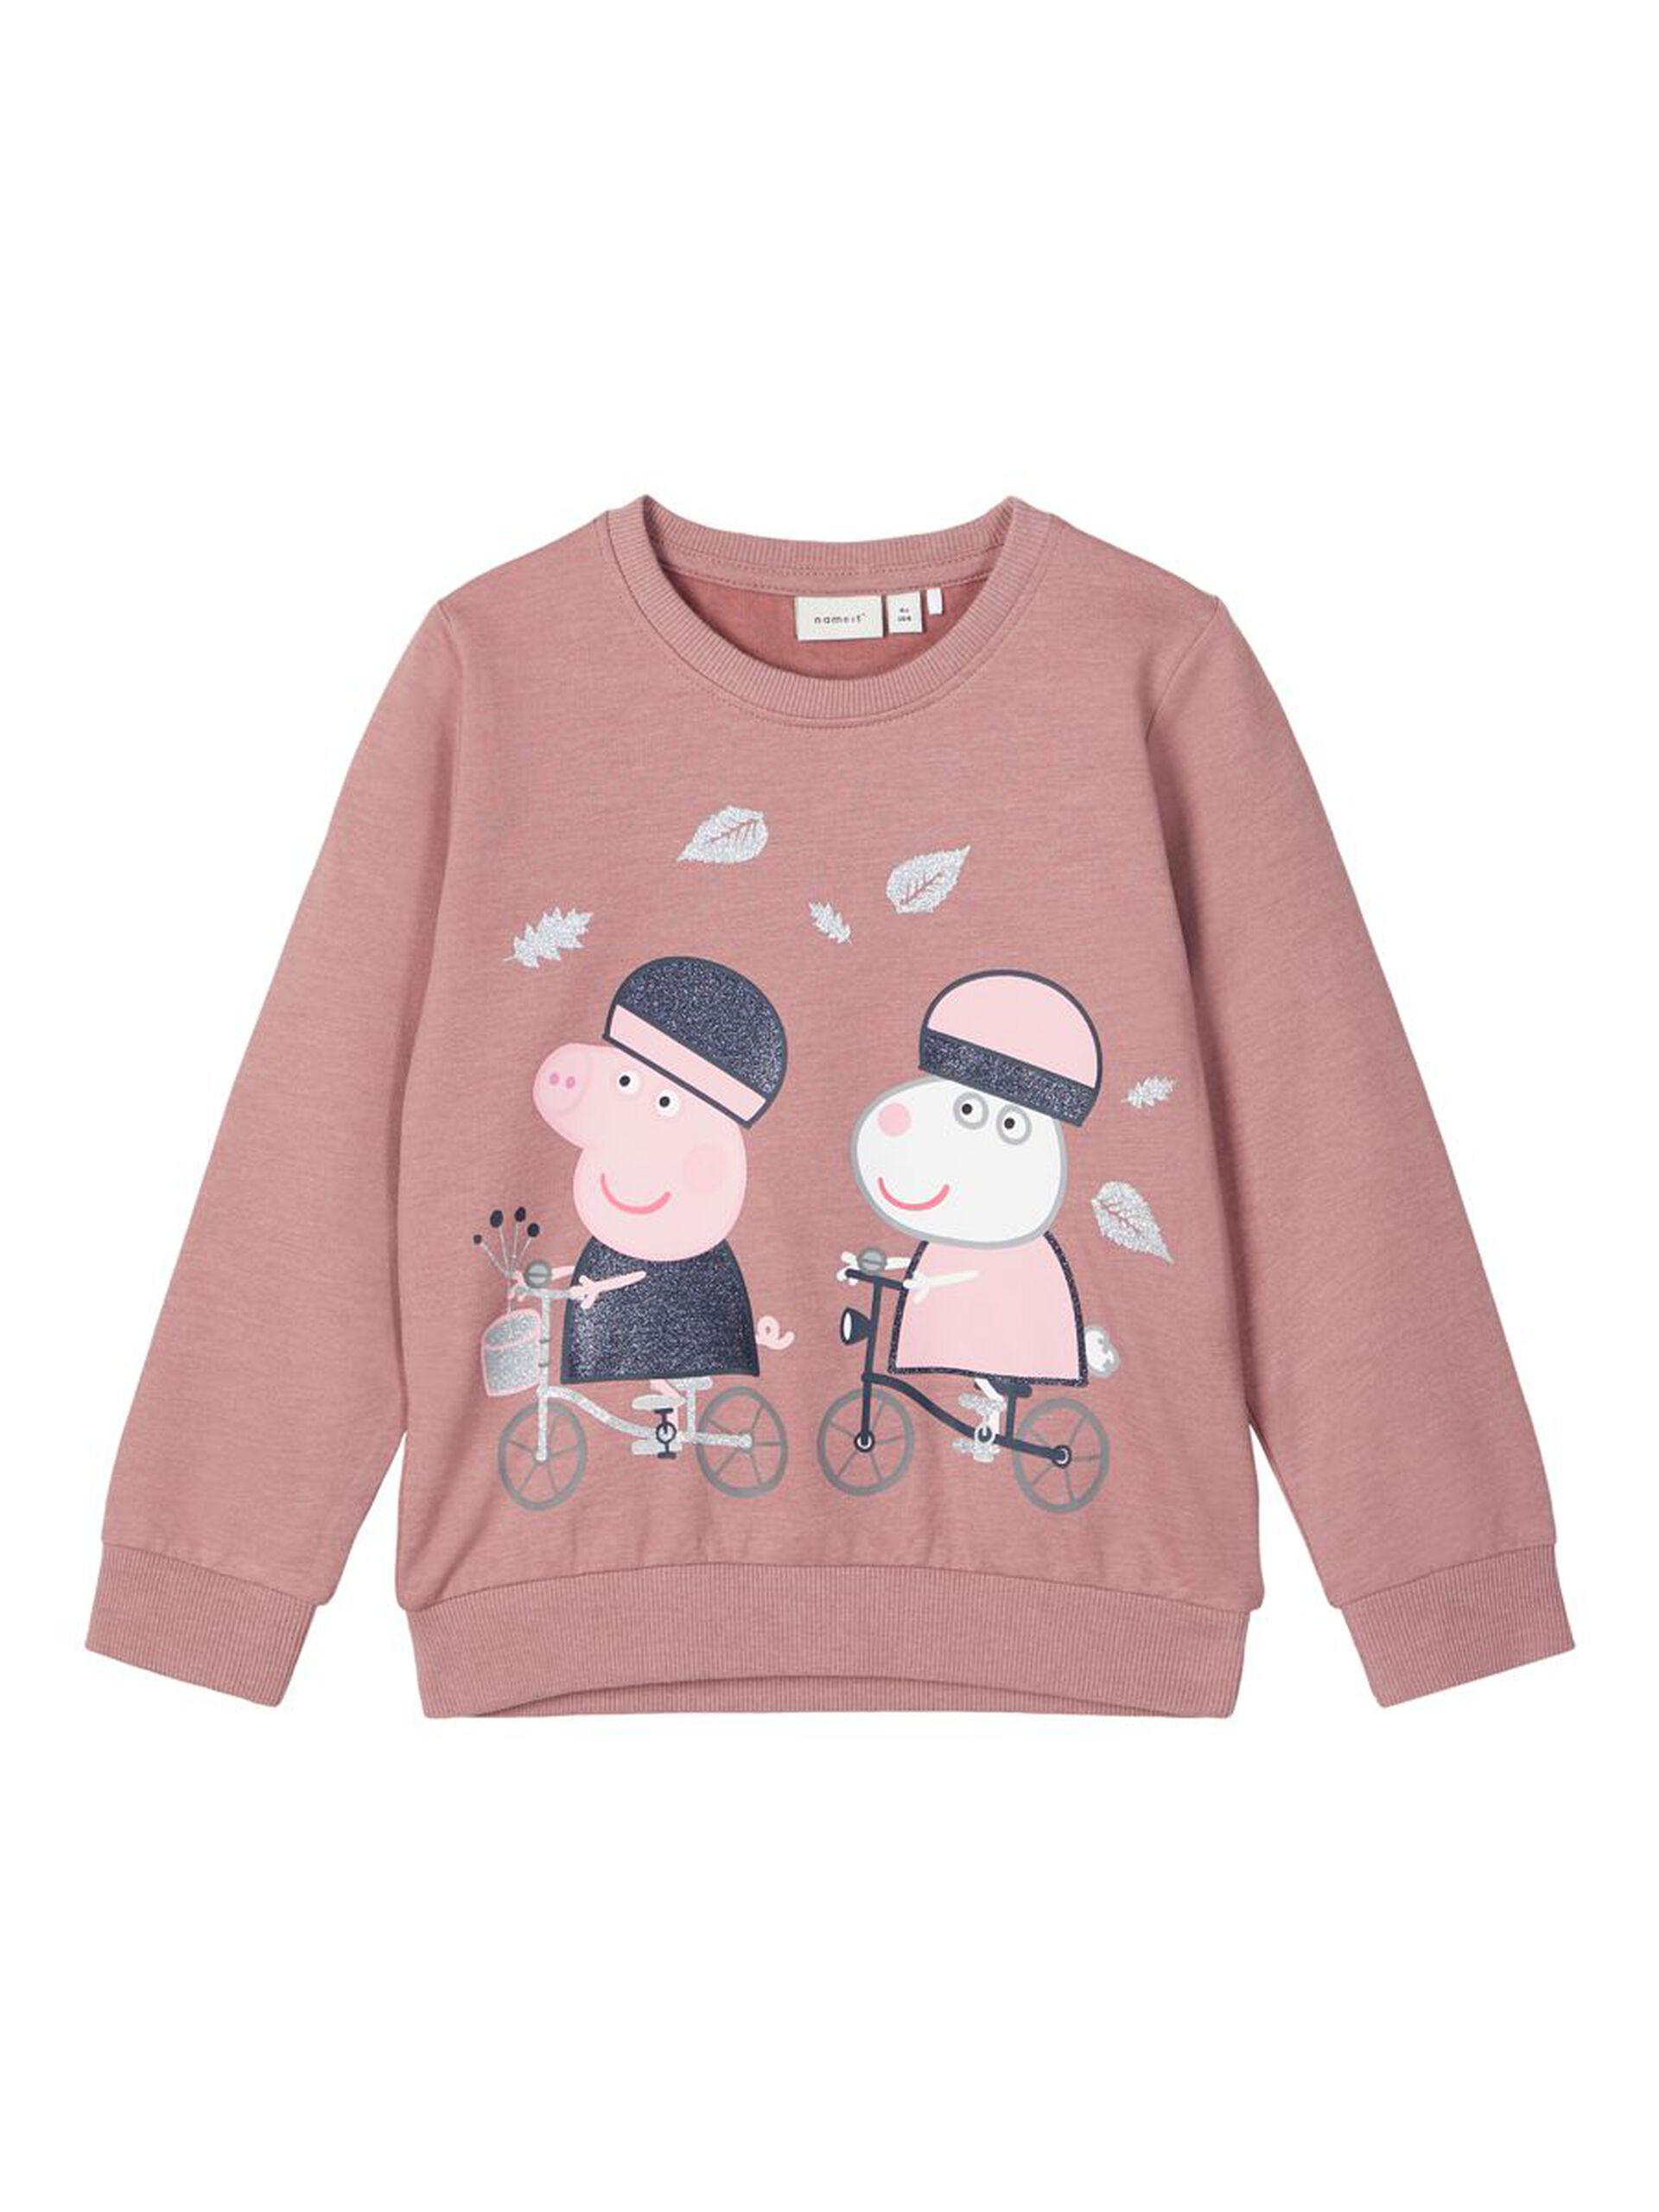 Peppa genser fra Name It – Name It rosa genser Peppa Gris – Mio Trend